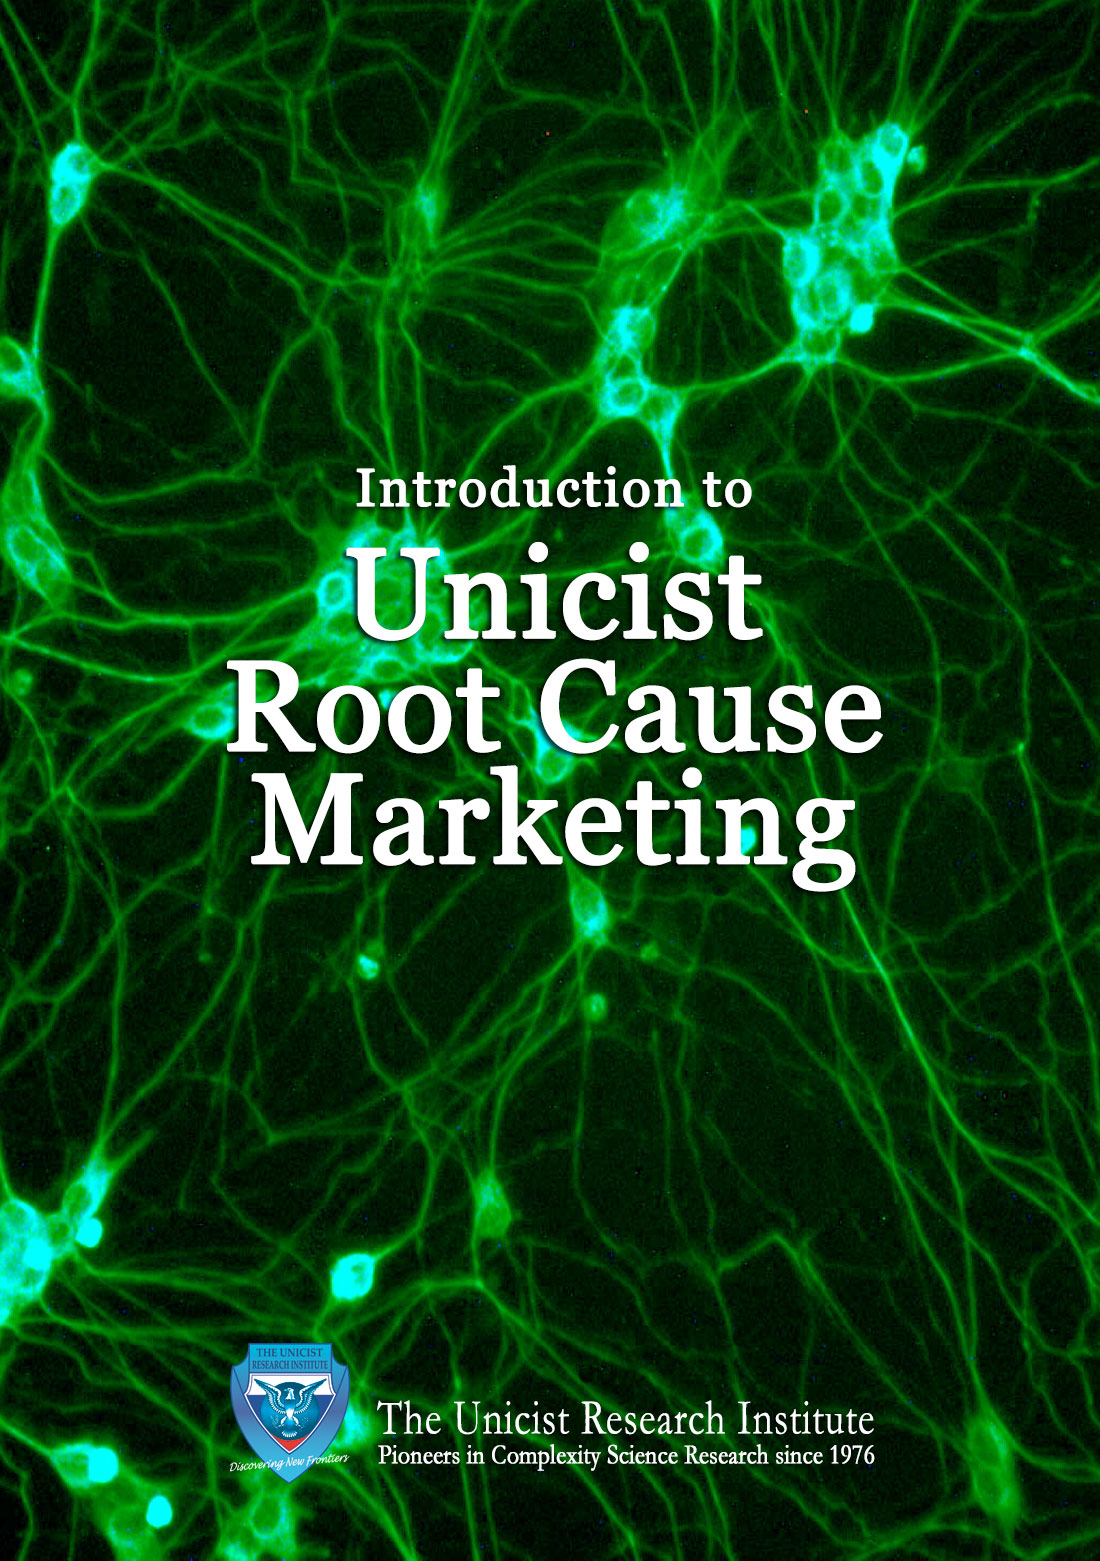 Unicist Root Cause Marketing